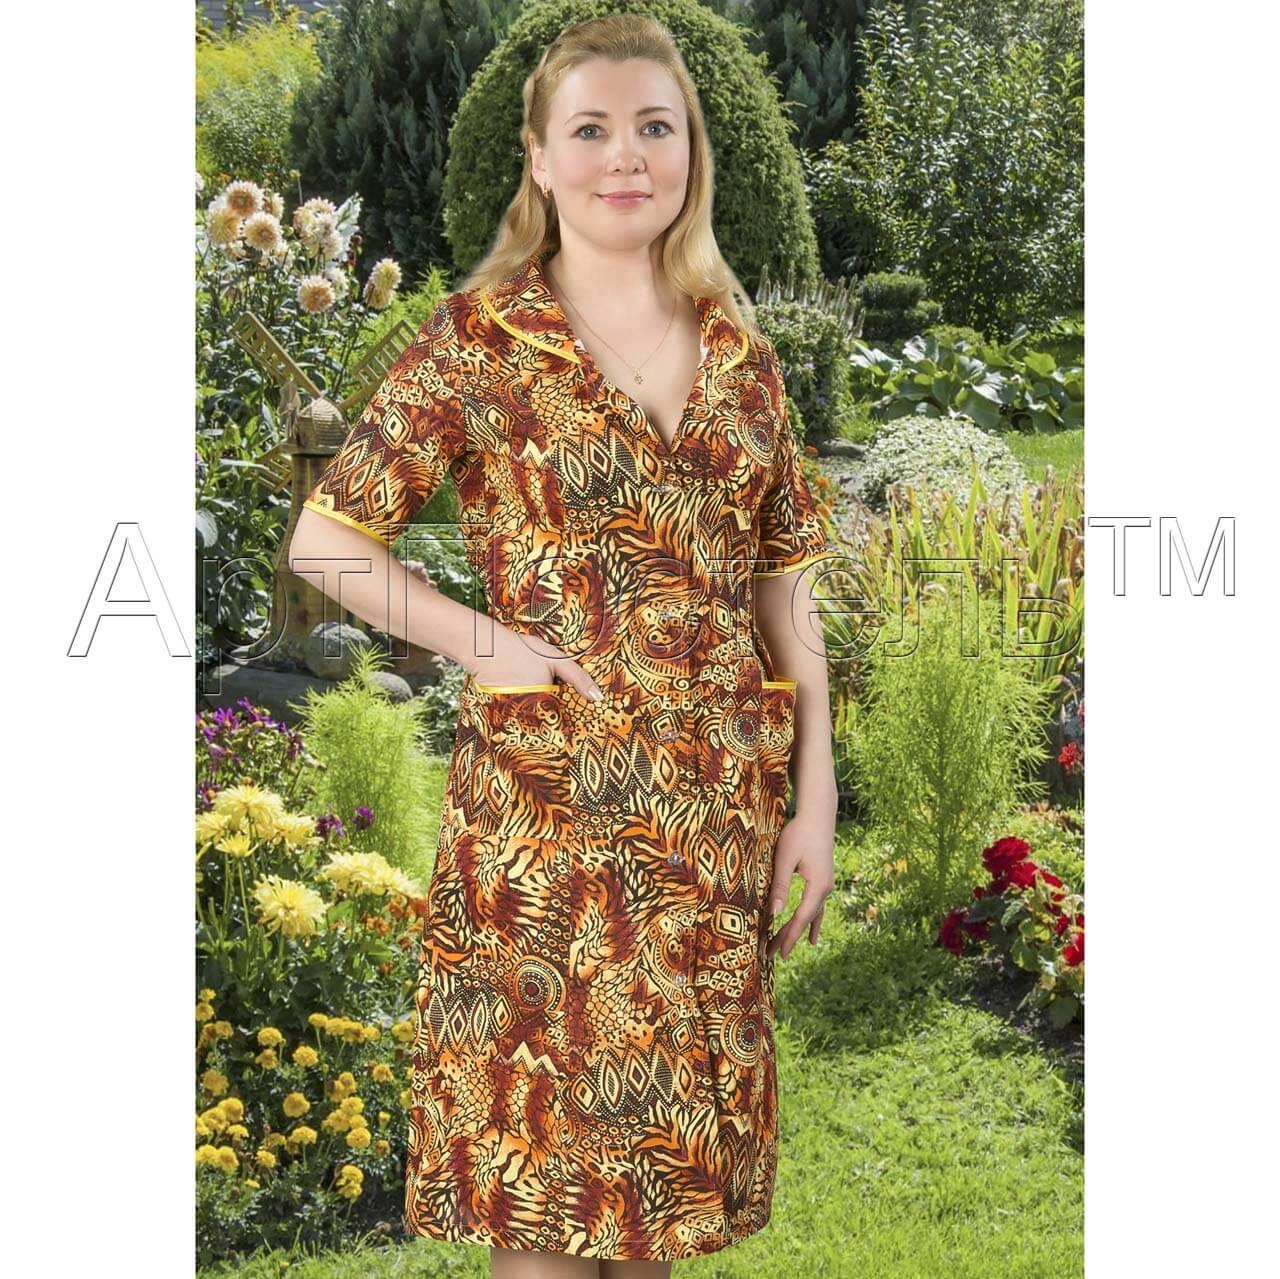 c2fdfbbdef8f3 Купить женский халат на пуговицах Африканские мотивы из бязи ...